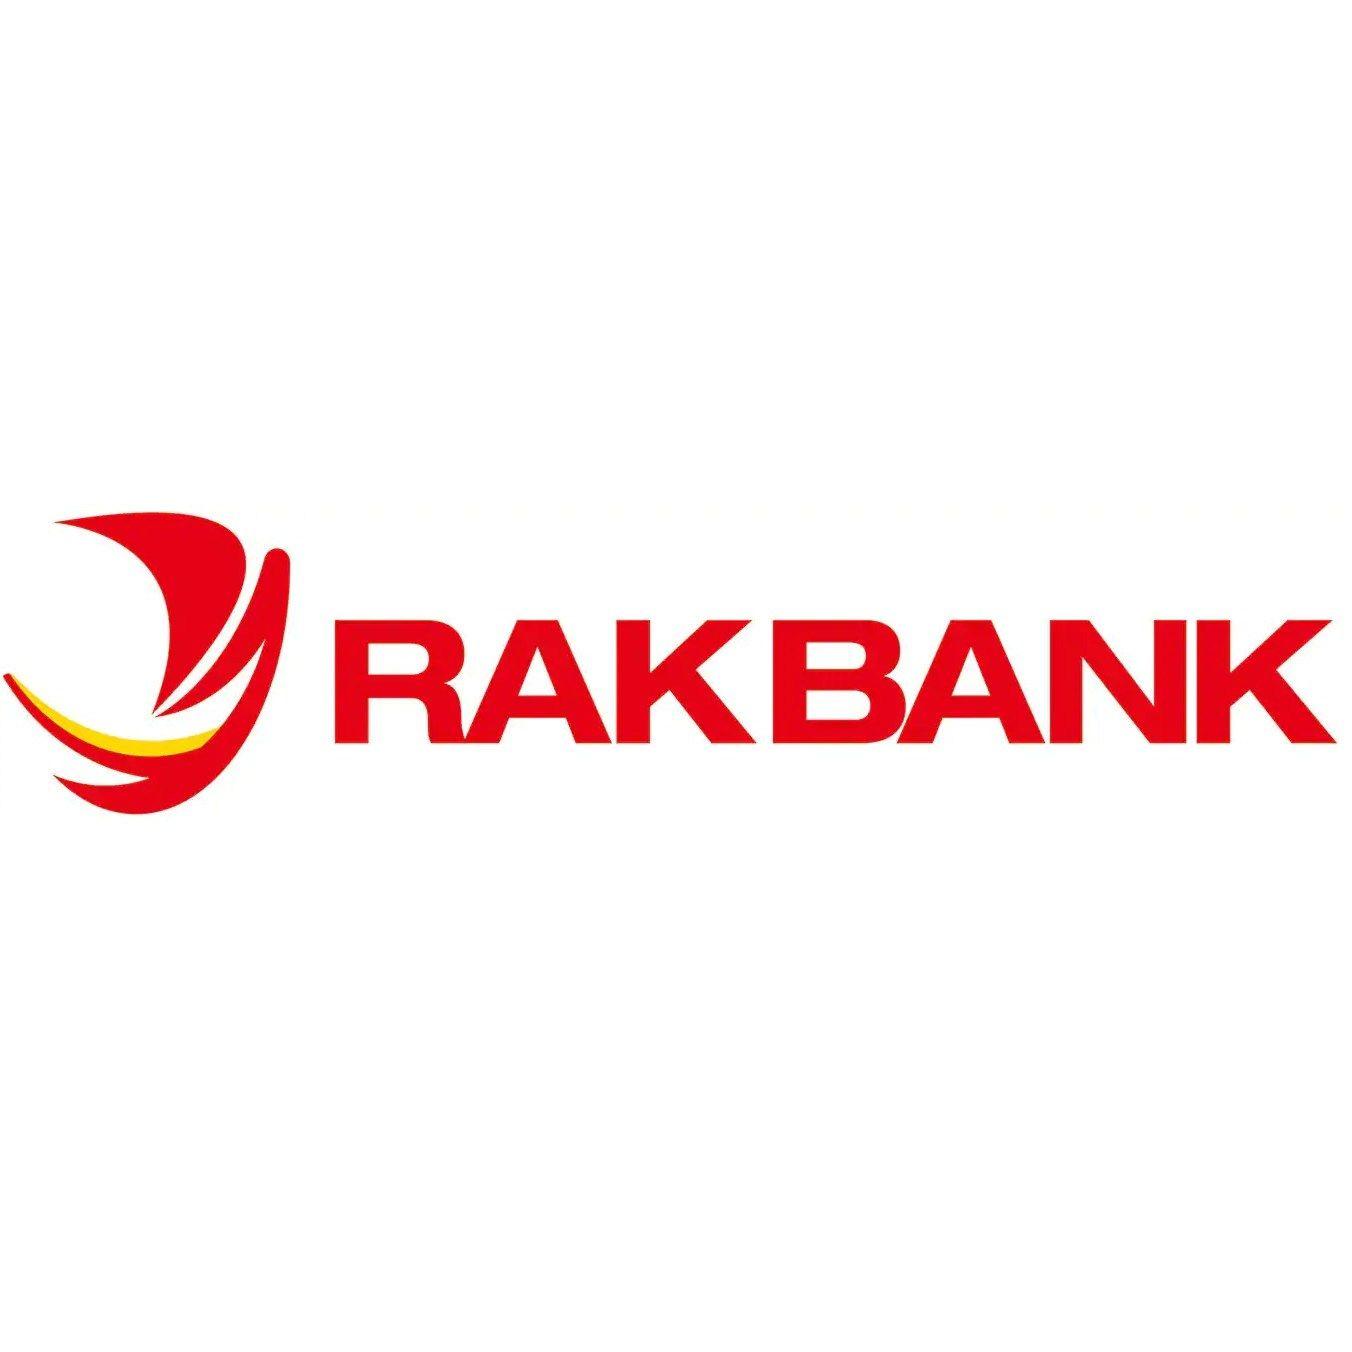 RAK BANK ATM MACHINE